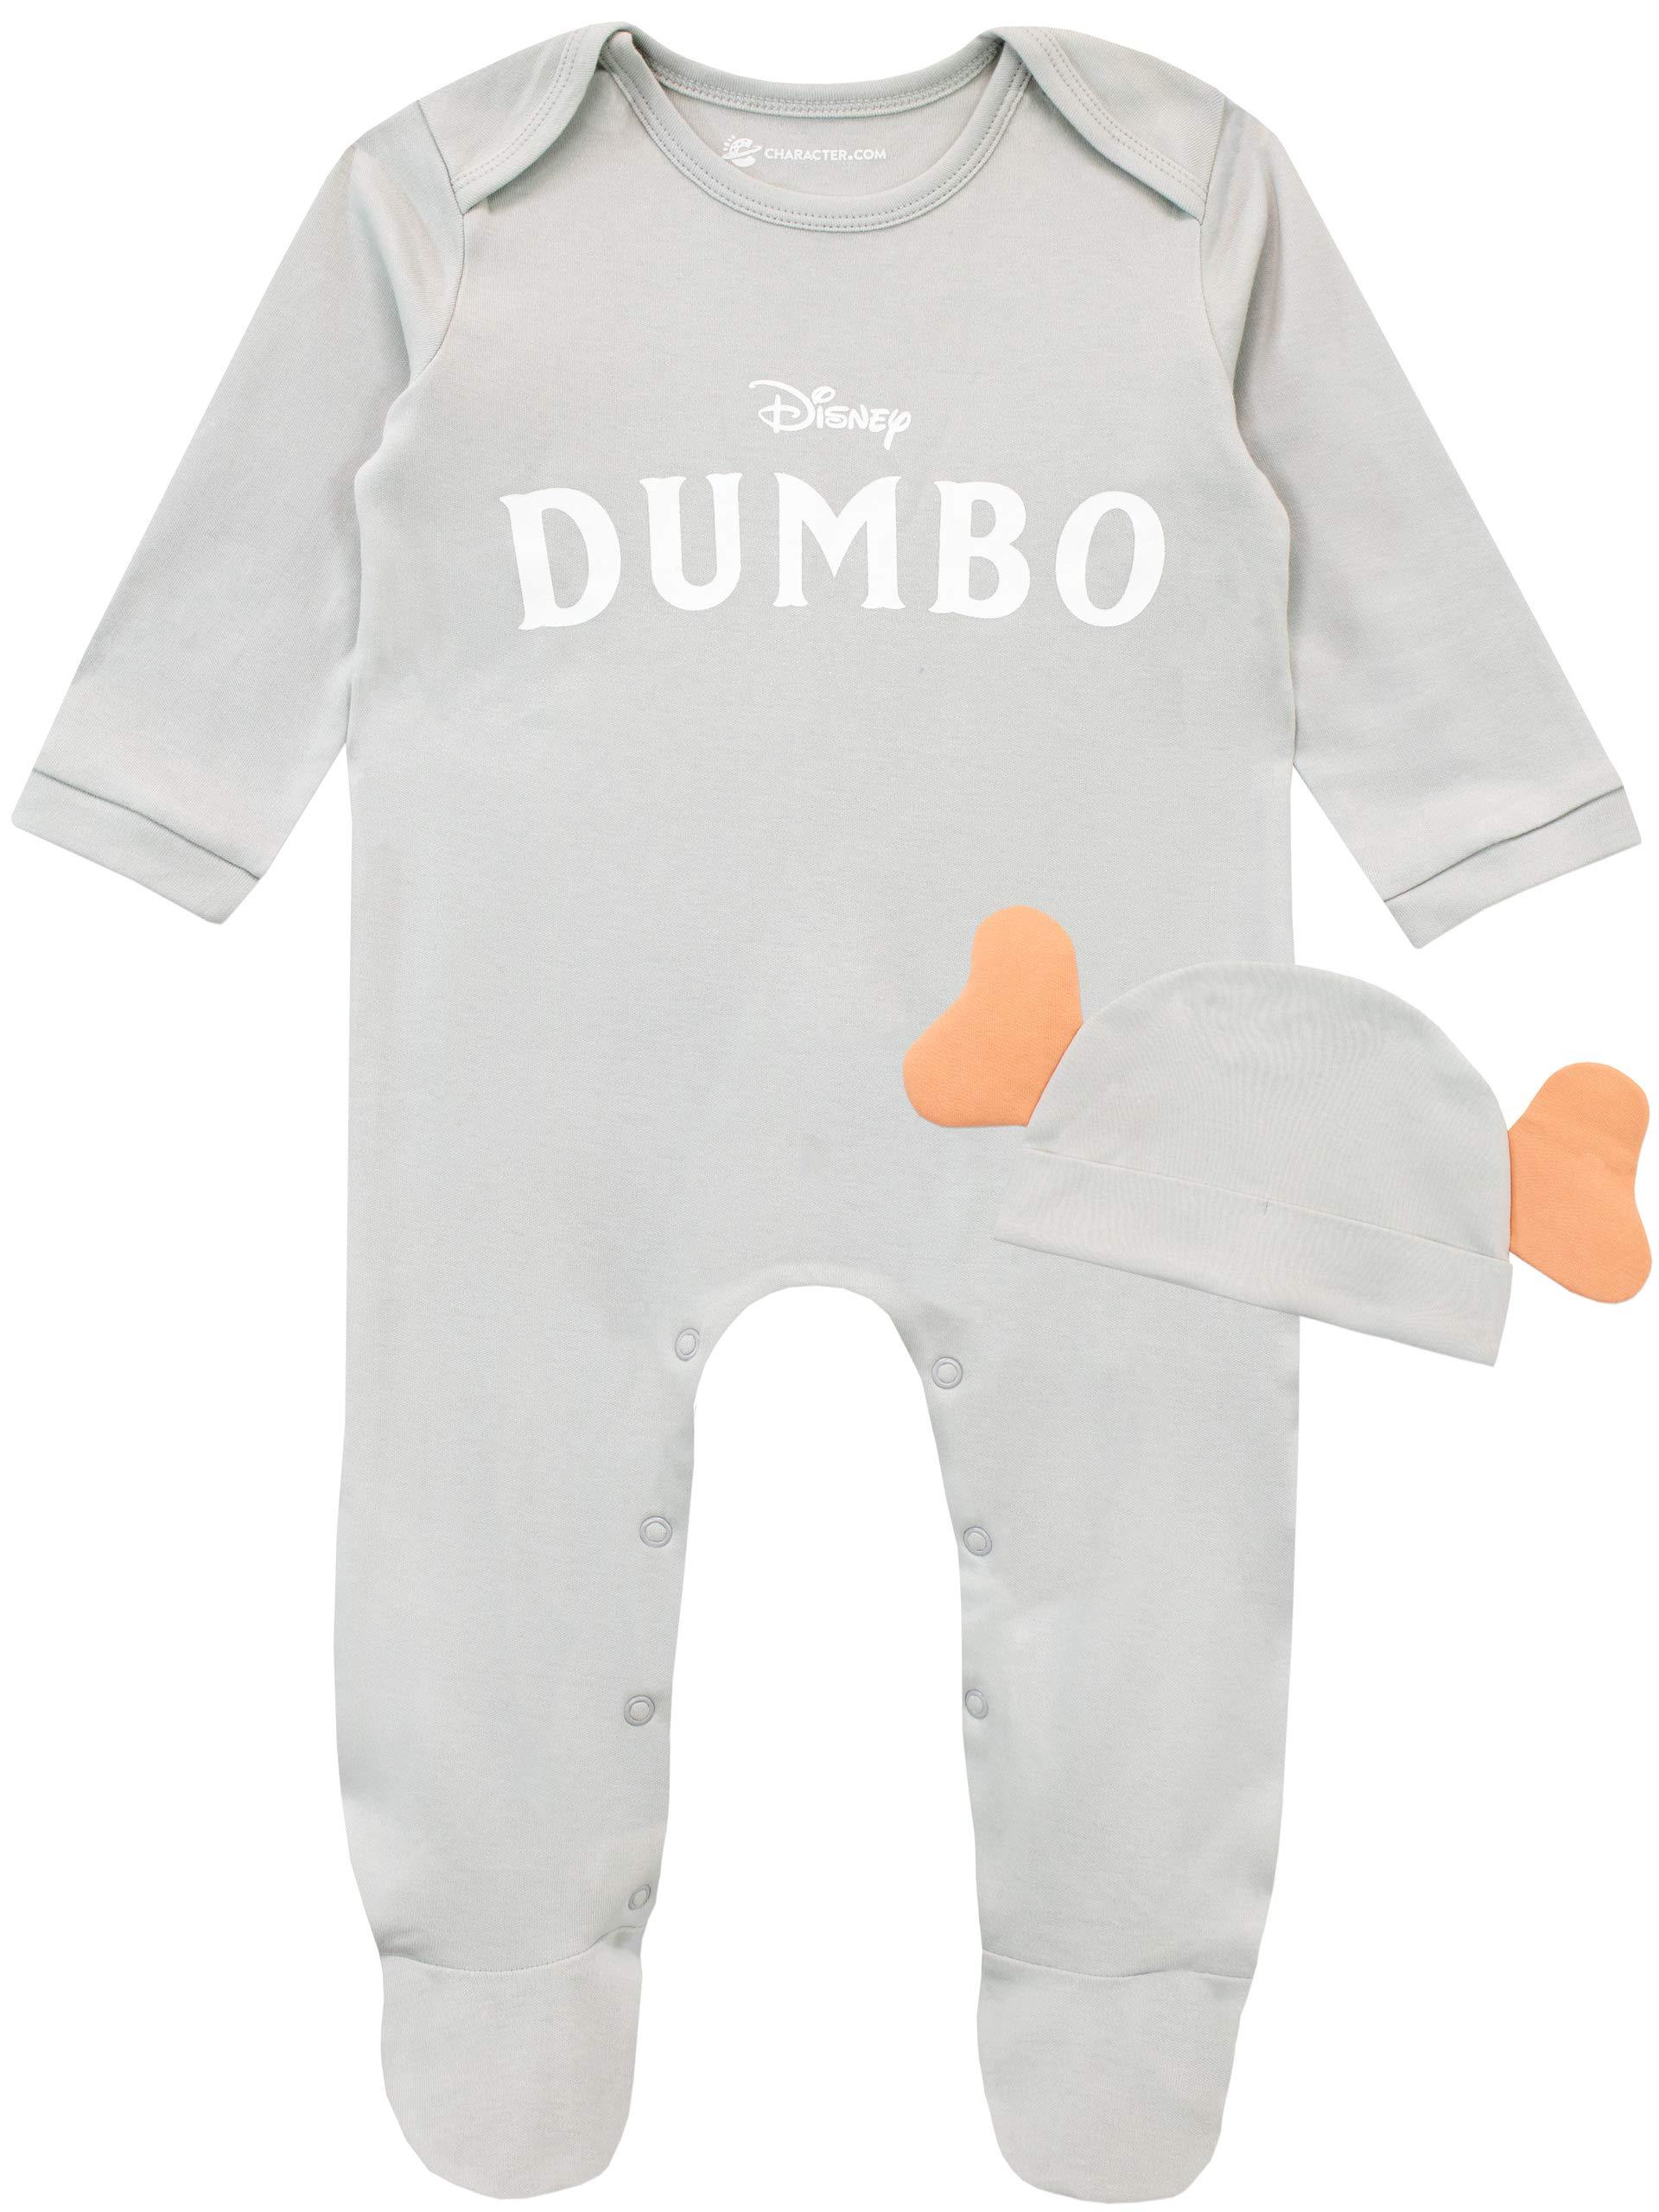 Disney Pijama Entera con Gorro para Niños Bebés Dumbo 1